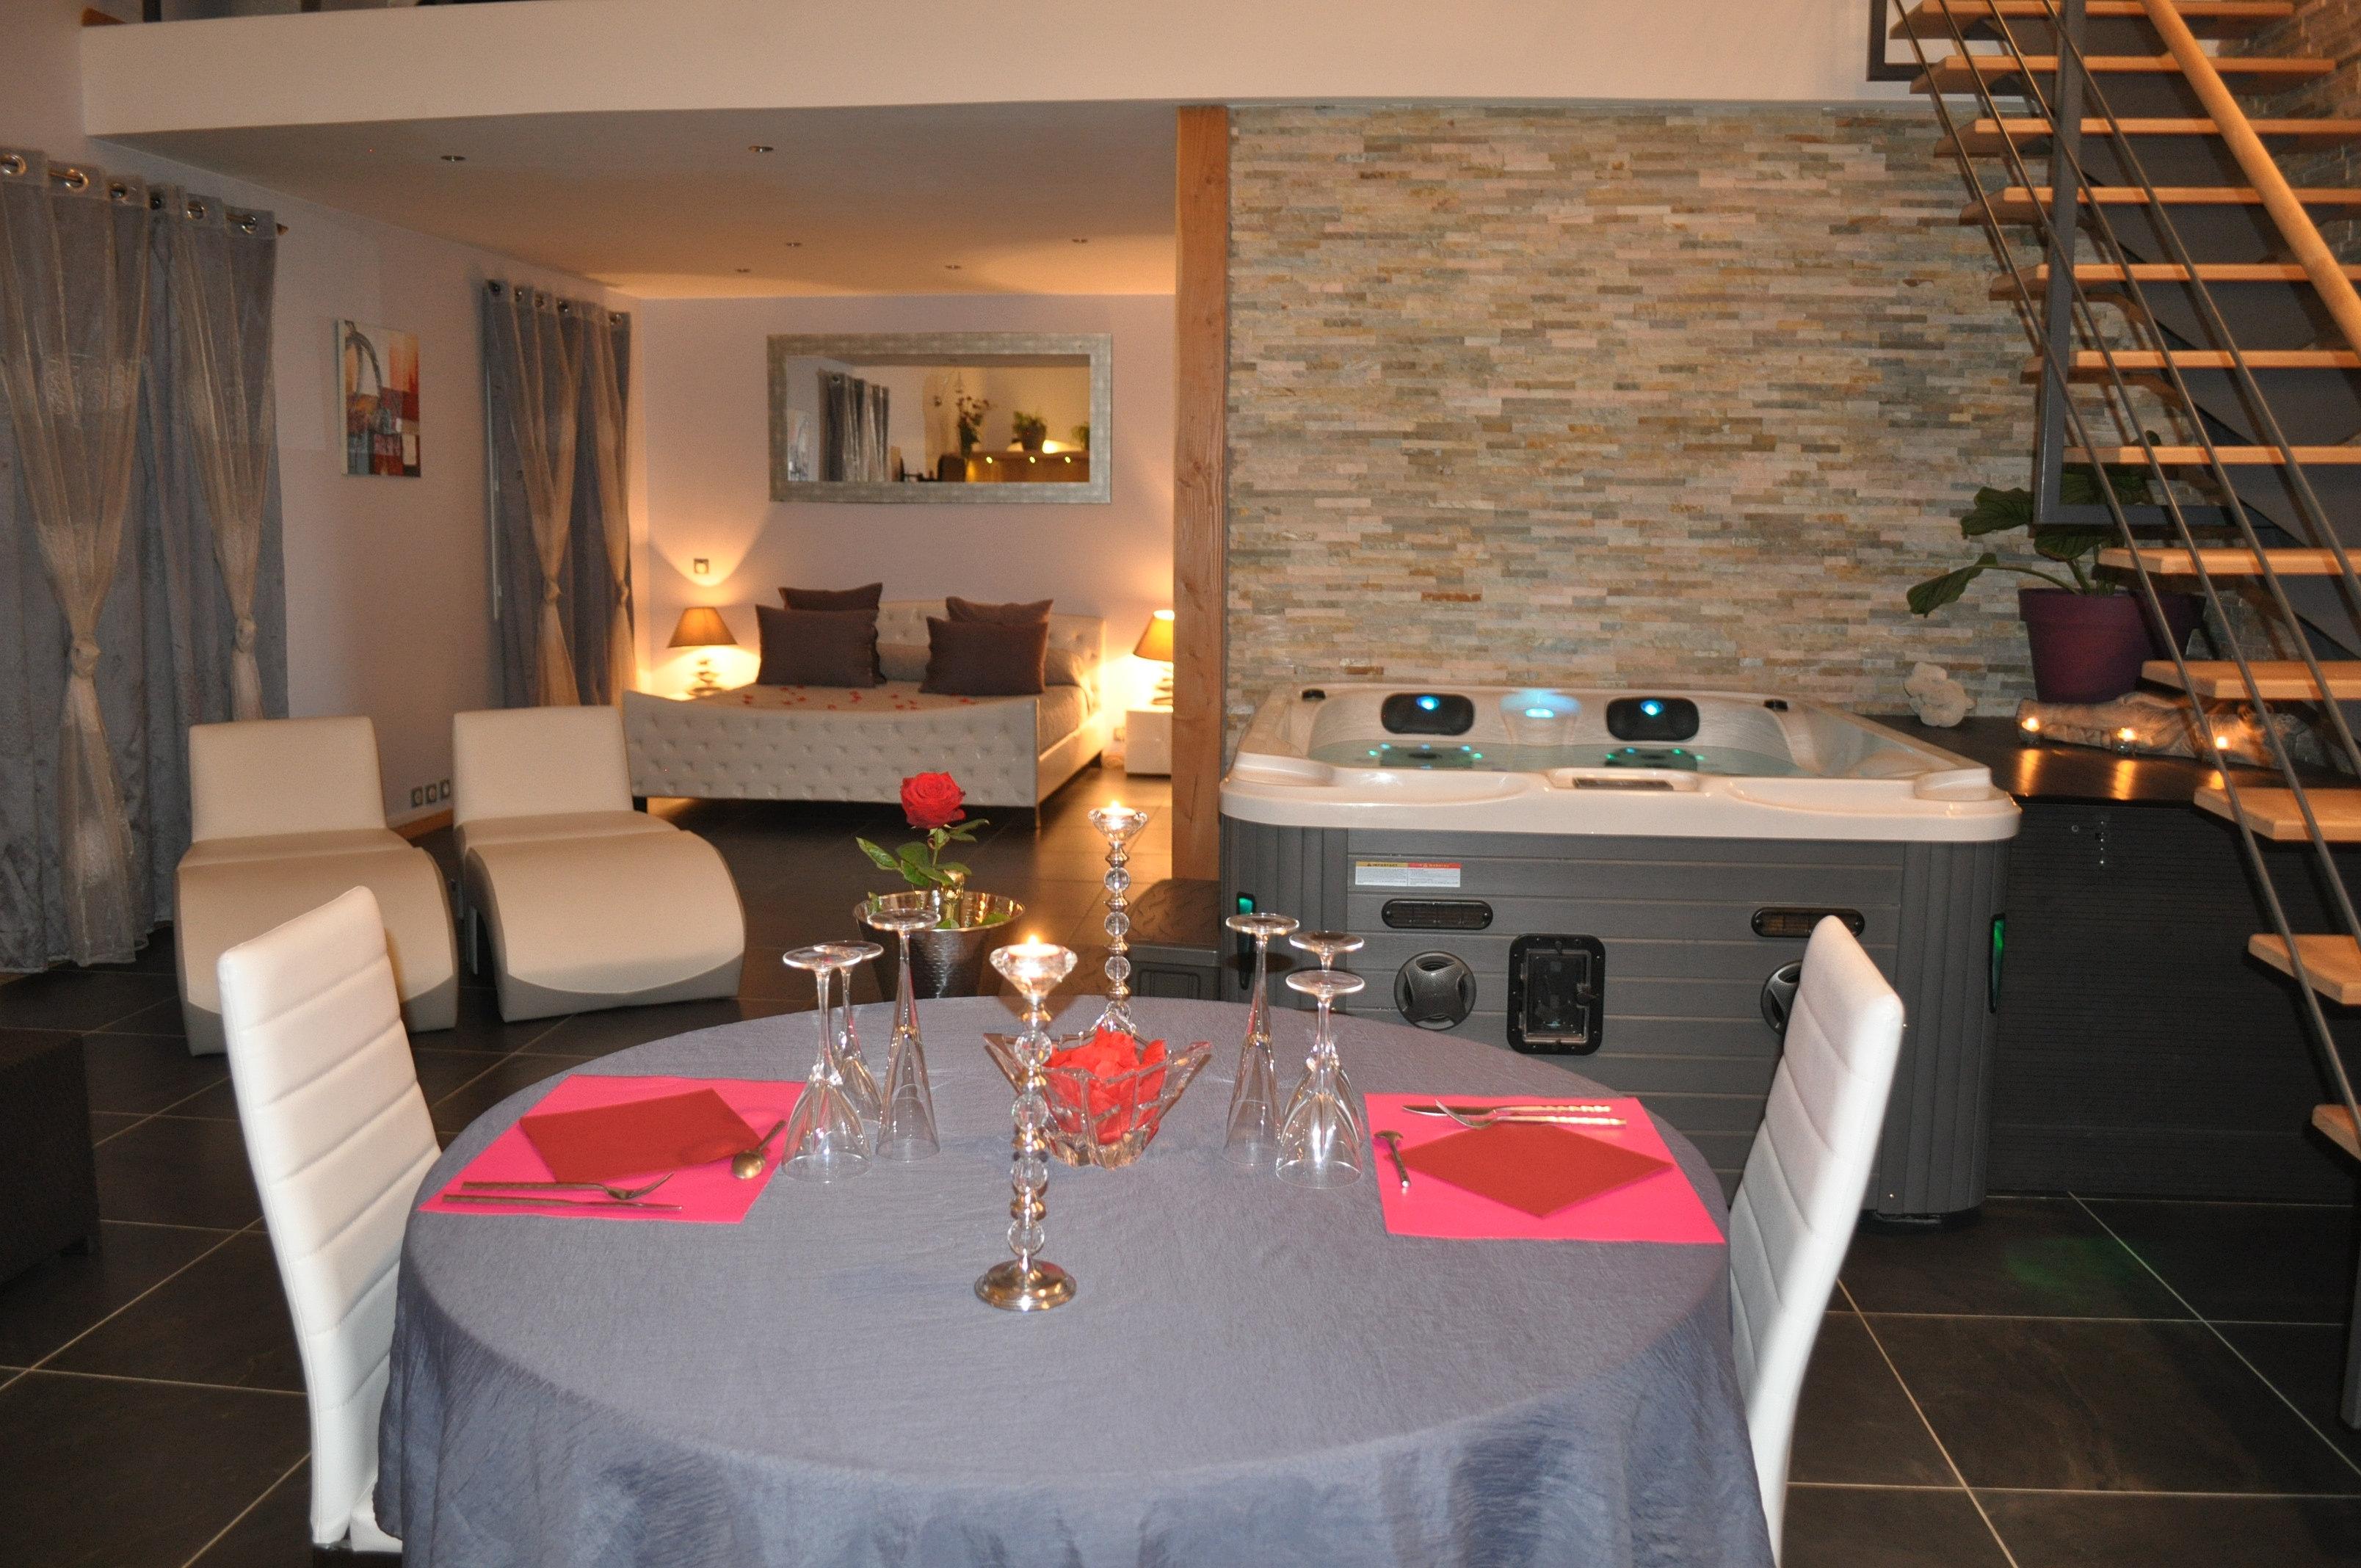 soiree romantique a la maison idee ventana blog. Black Bedroom Furniture Sets. Home Design Ideas